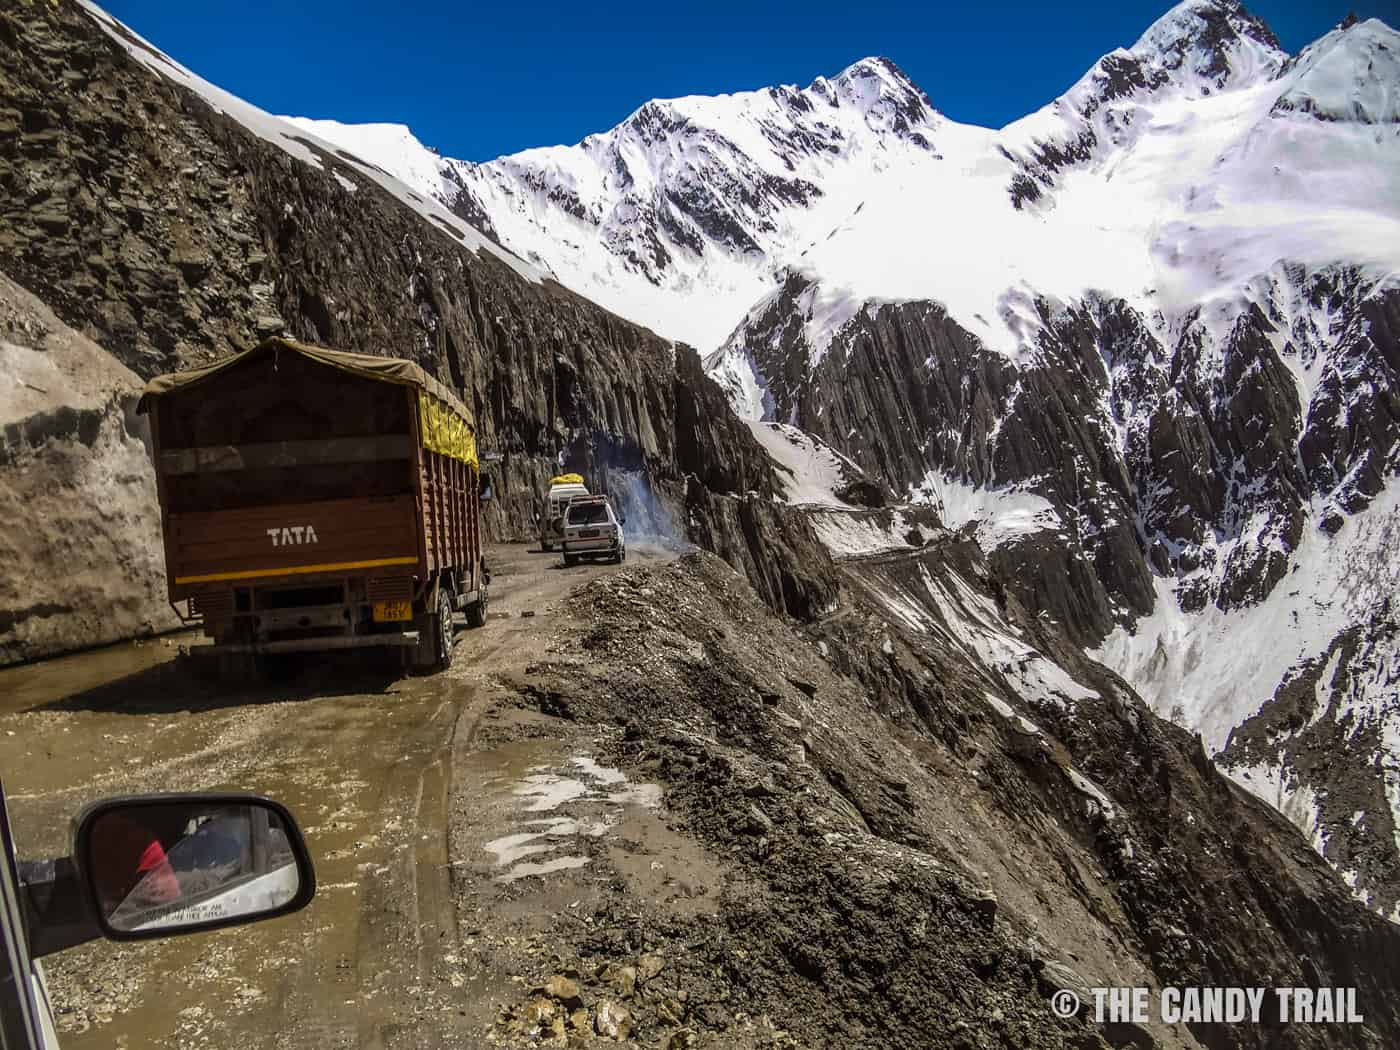 leh-highway-trucks-on-mountain-road